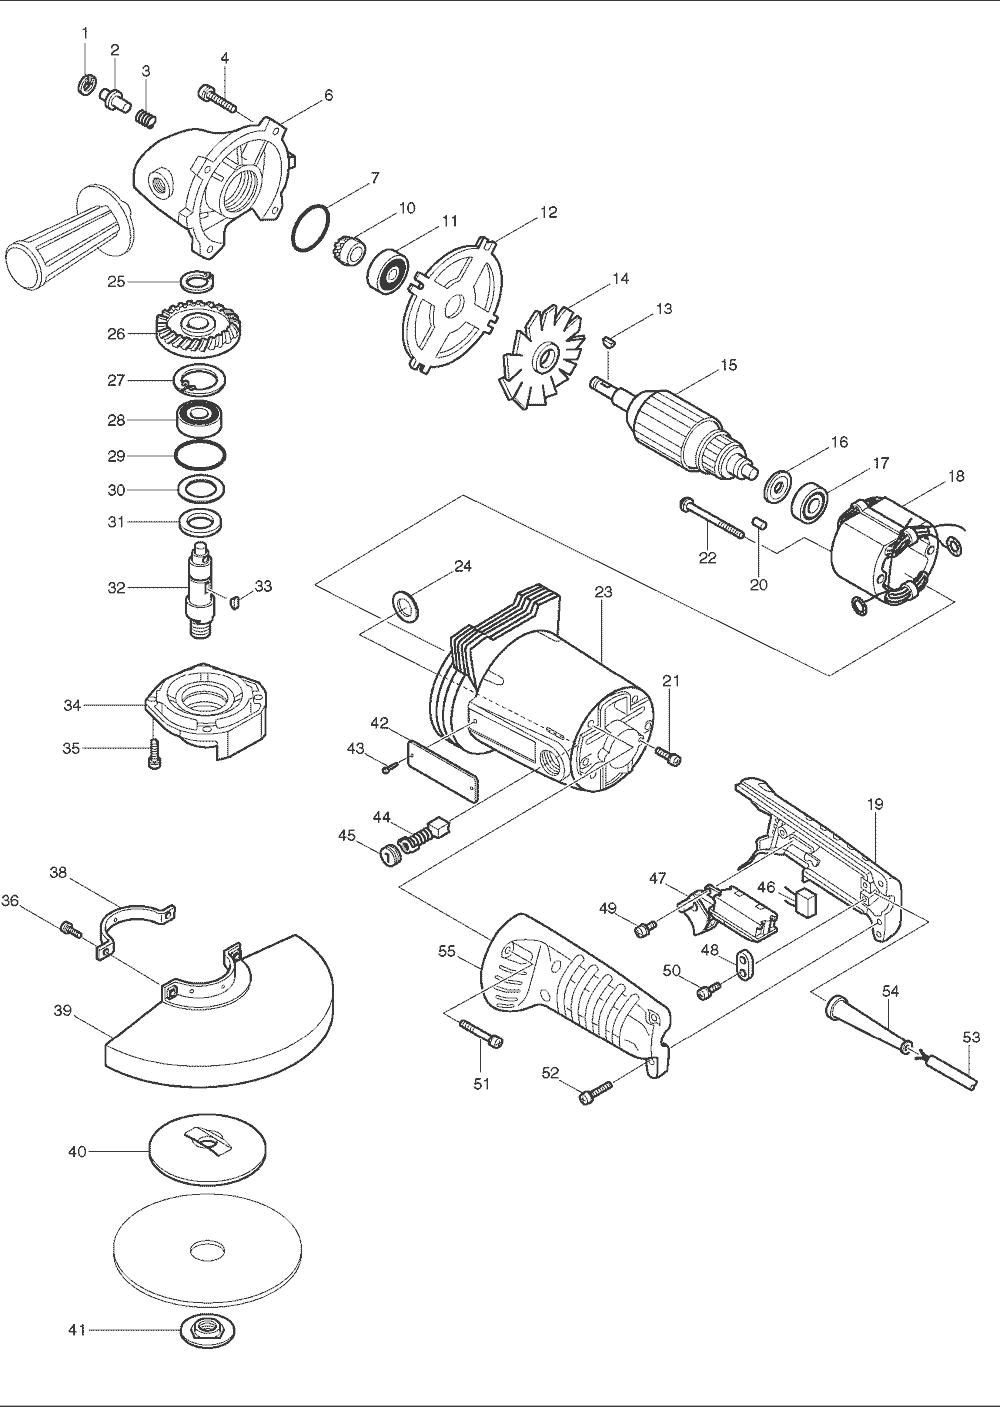 grinder wiring diagram ken stone s modular synthesizer